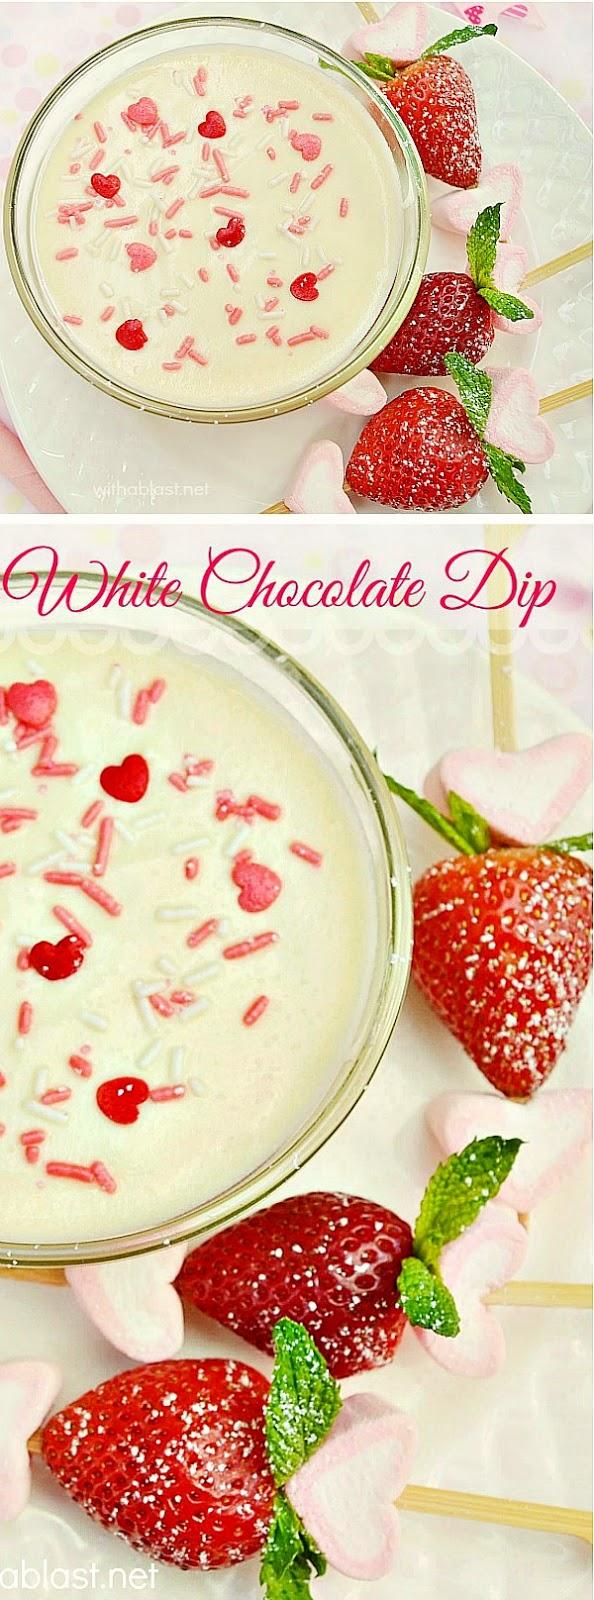 White Chocolate Dip